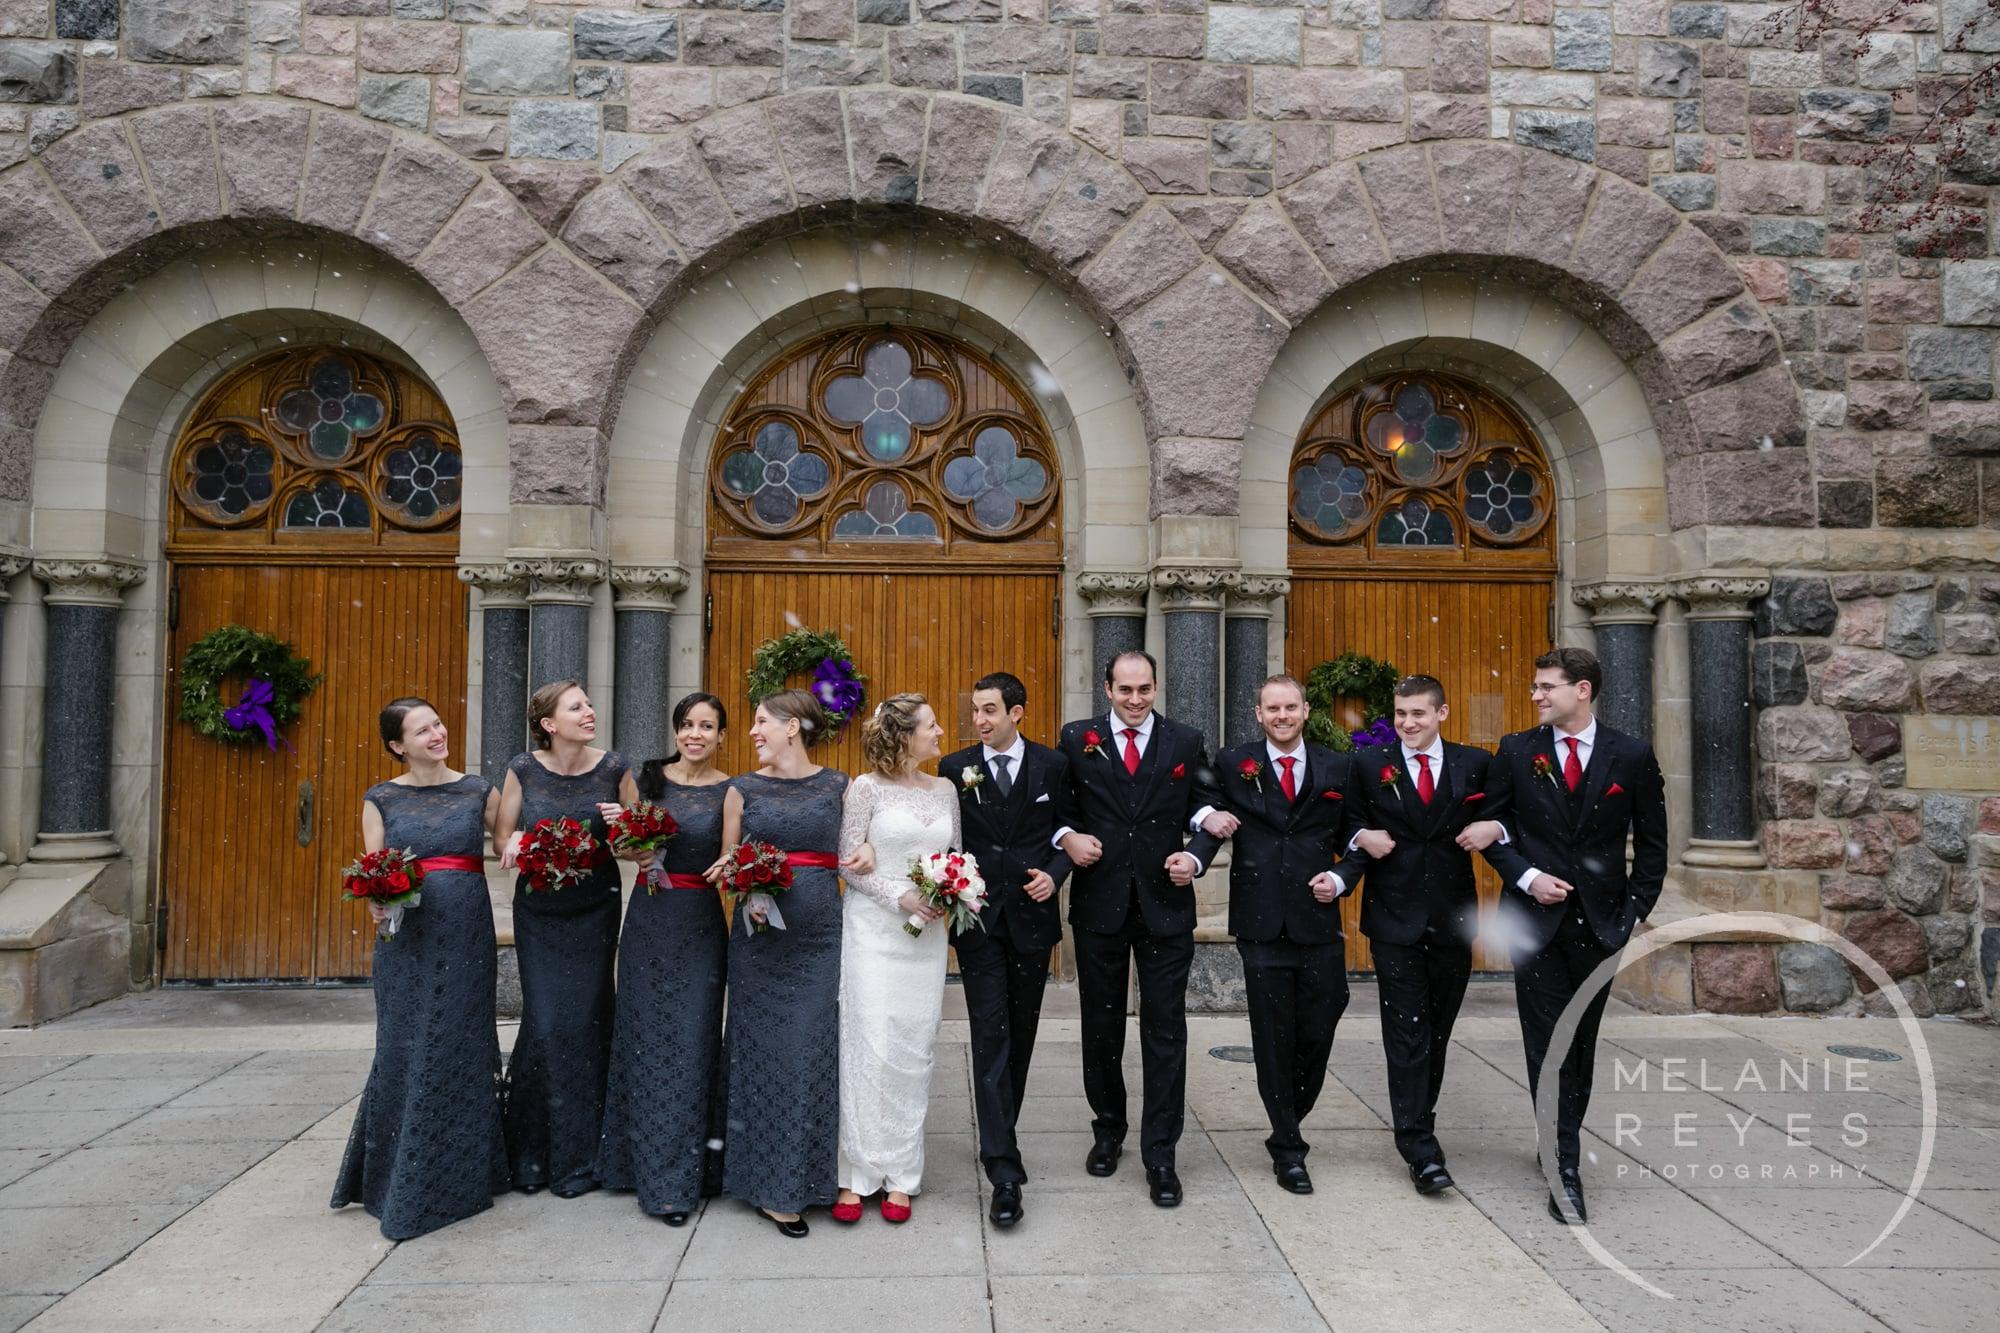 2015_ann_arbor_wedding_photographer_melaniereyes_012.JPG